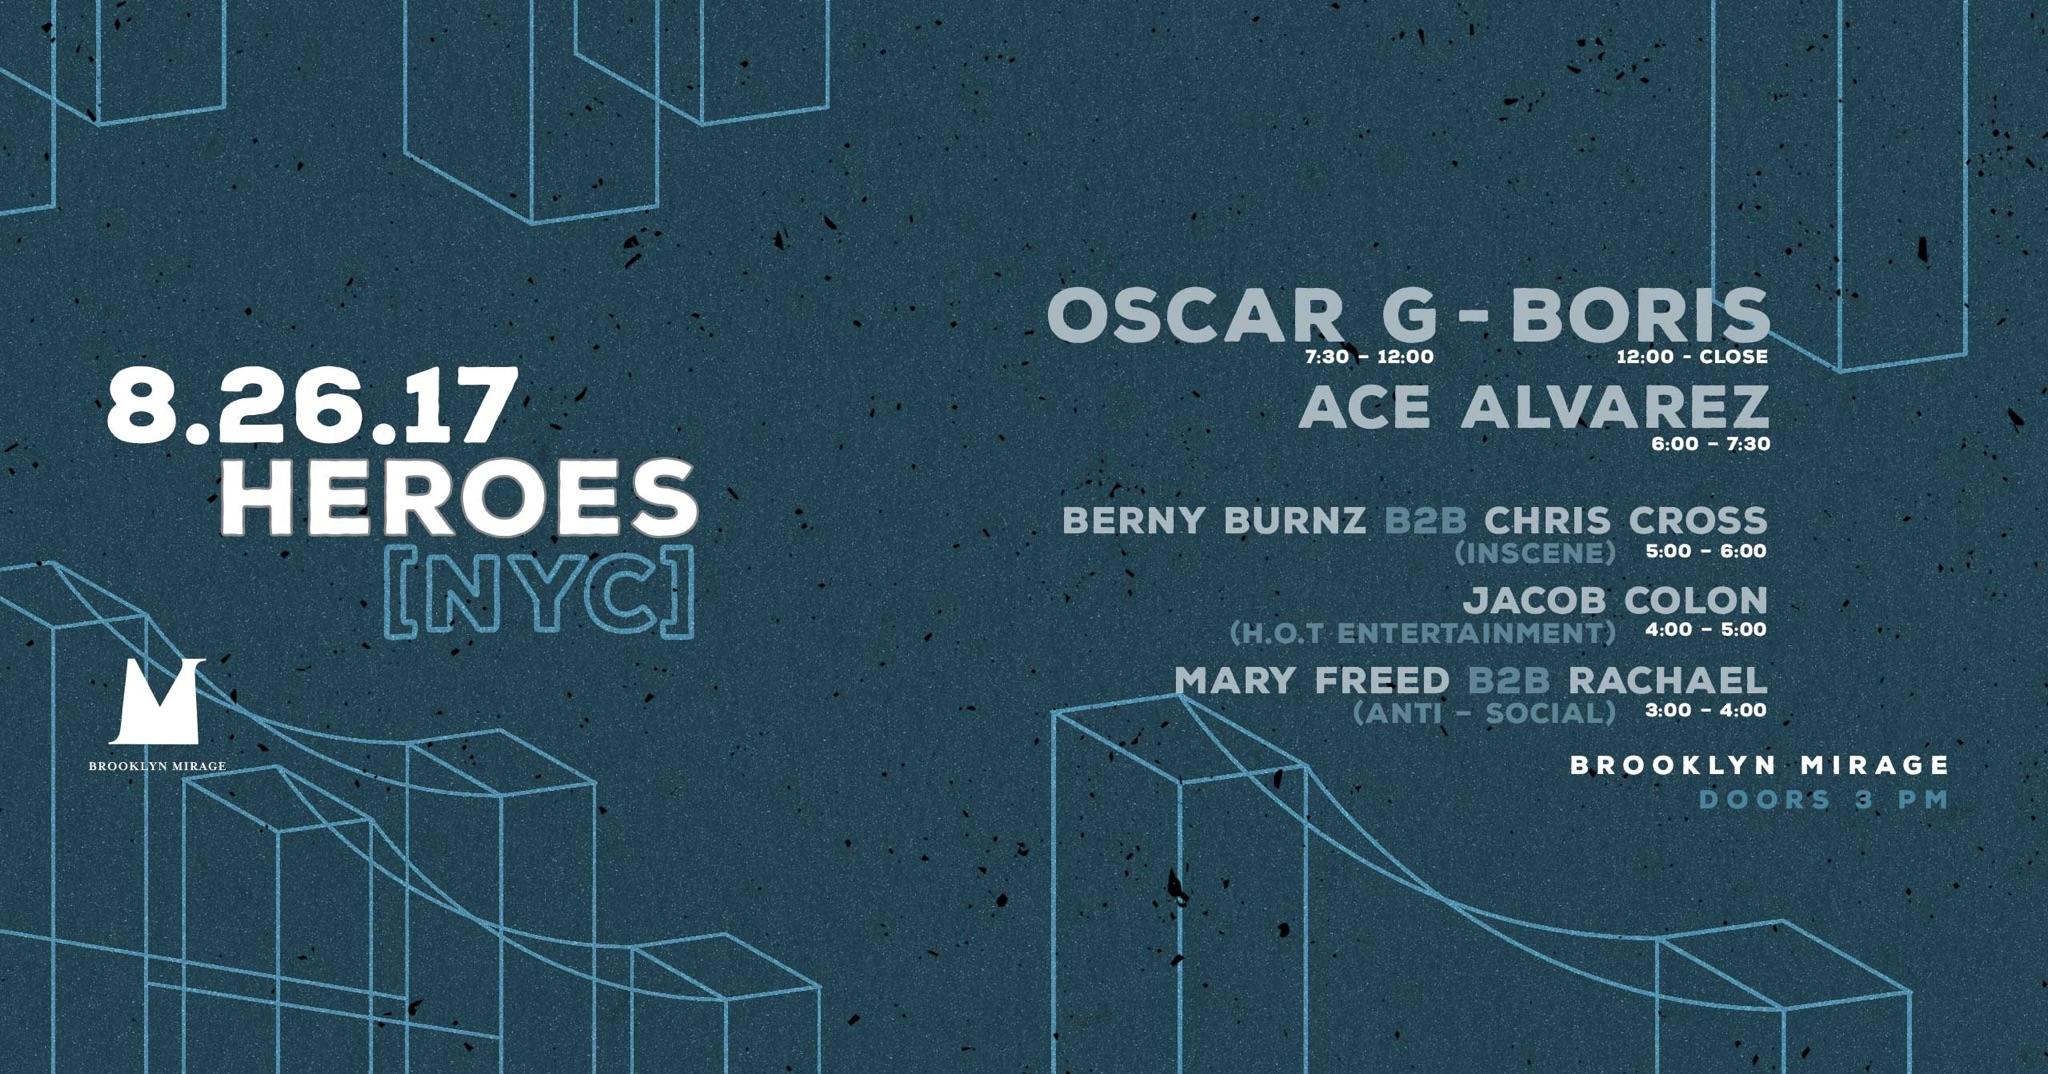 Oscar G Boris Ace Alvarez Brooklyn Mirage Robbie Lumpkin Promotions